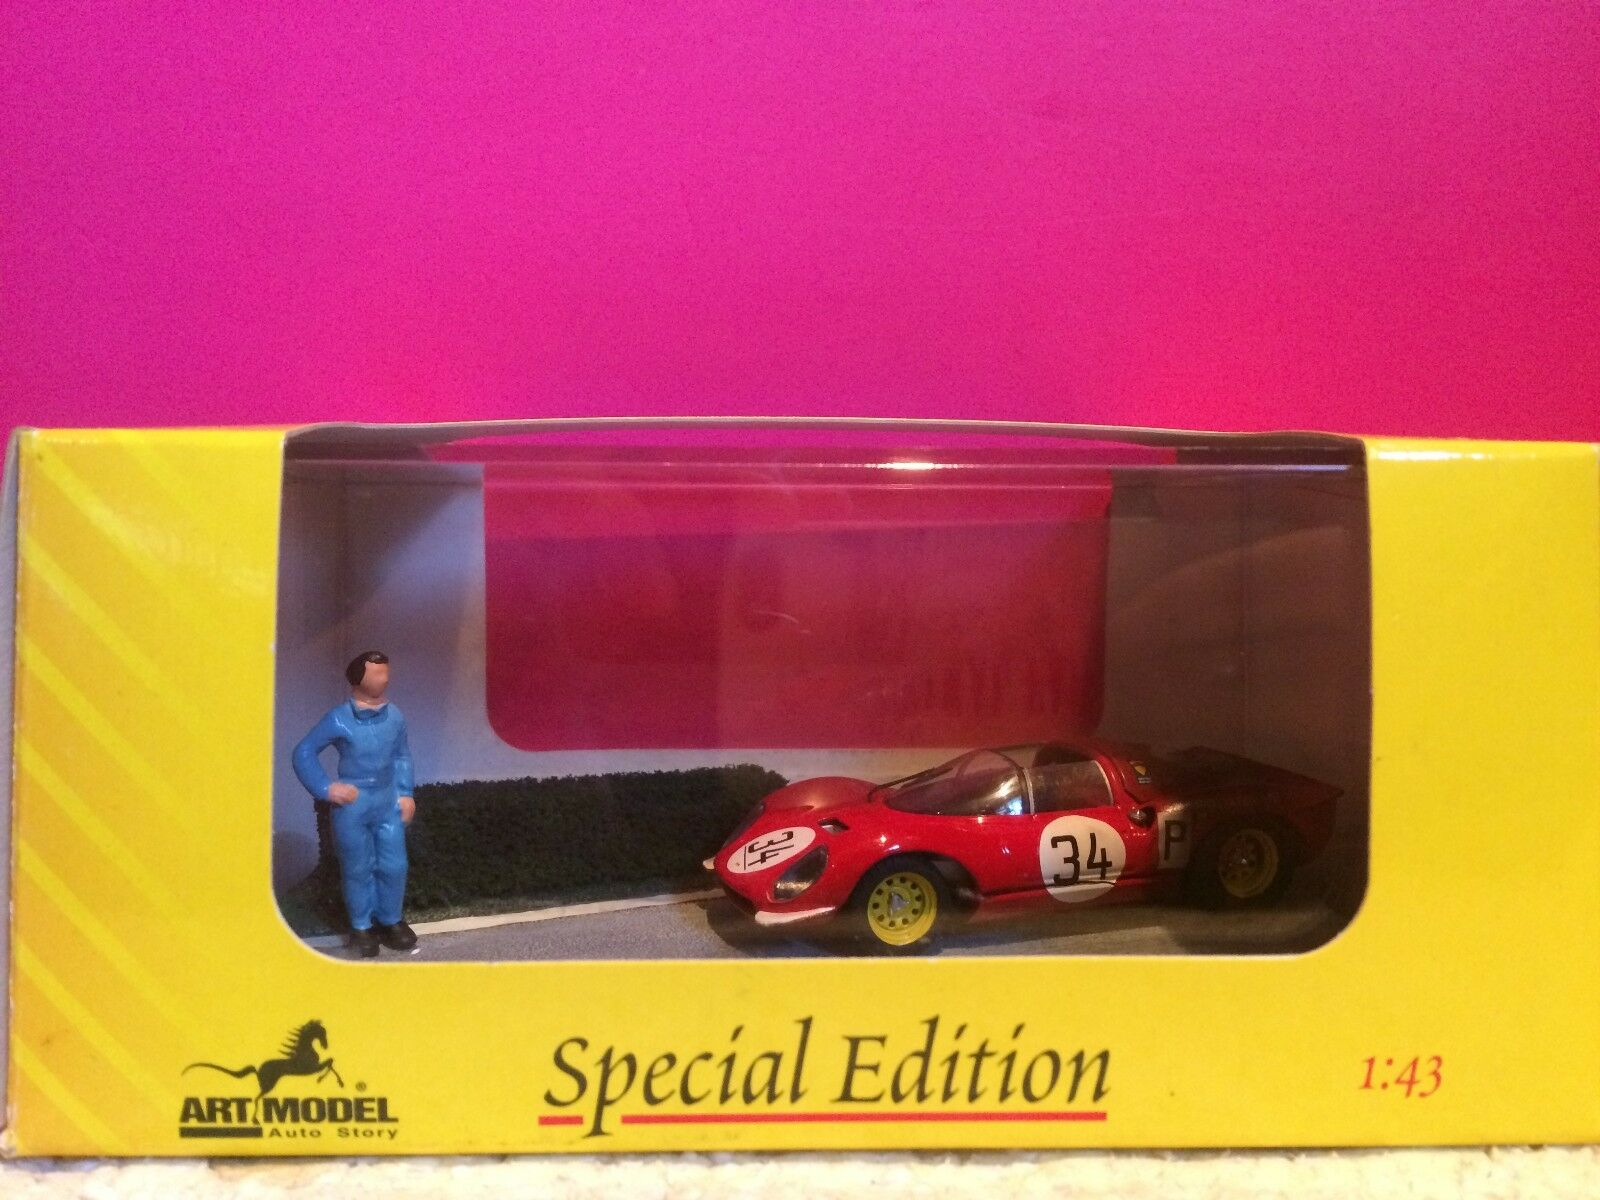 Art model ferrari dino superb diorama 206 nurburgring 1967 new box 1 43 g5